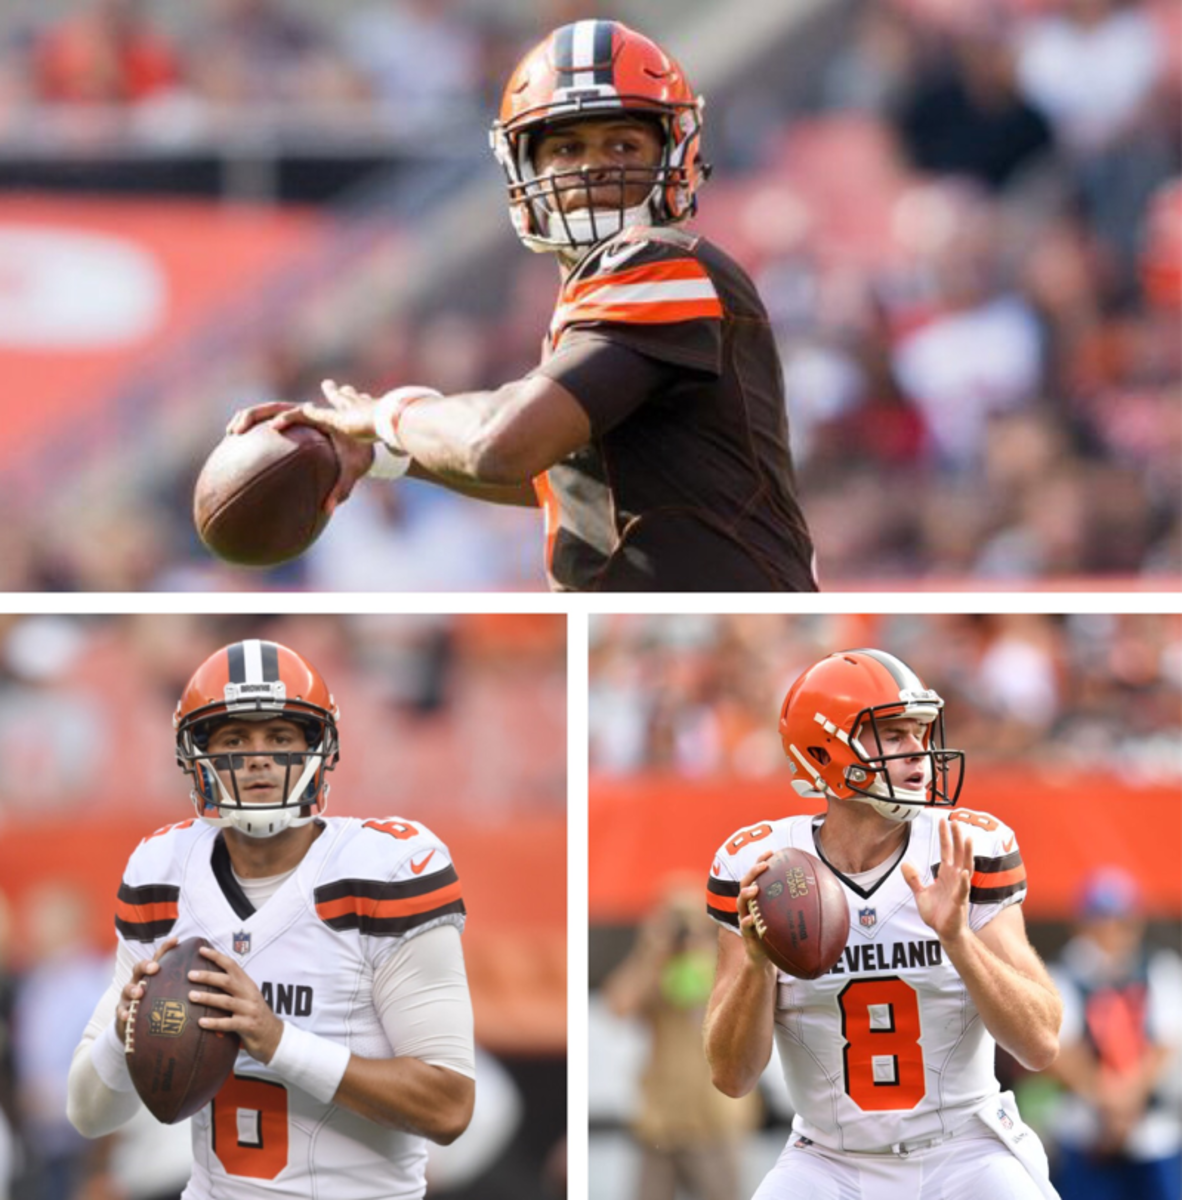 2017 Brown's quarterbacks(clockwise from top left): DeShone Kizer, Kevin Hogan, Cody Kessler